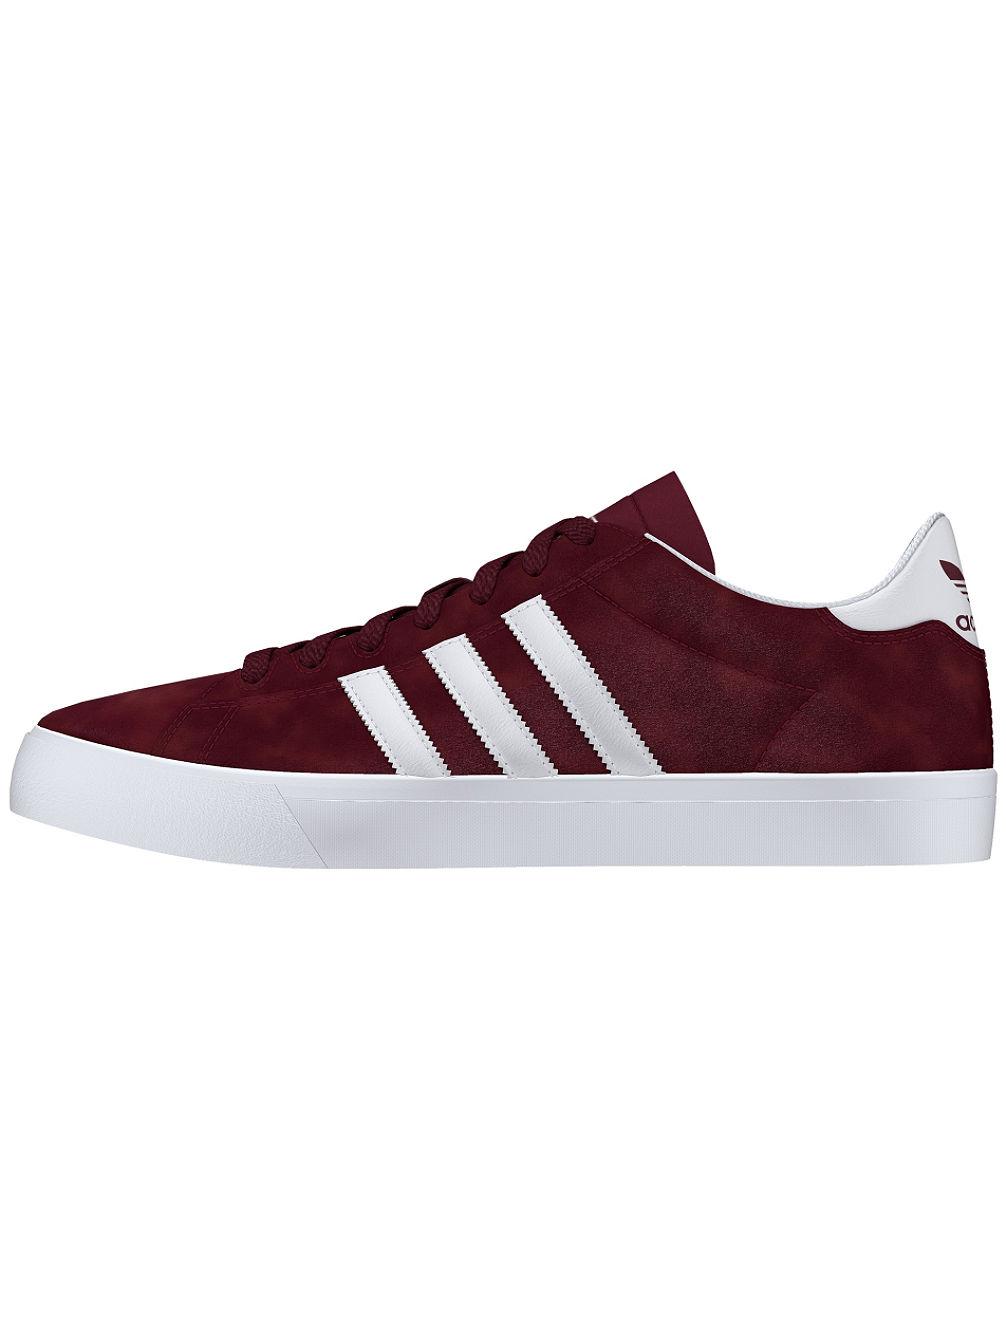 Buy adidas Skateboarding Campus Vulc II ADV Skate Shoes online at ... 78ff828890